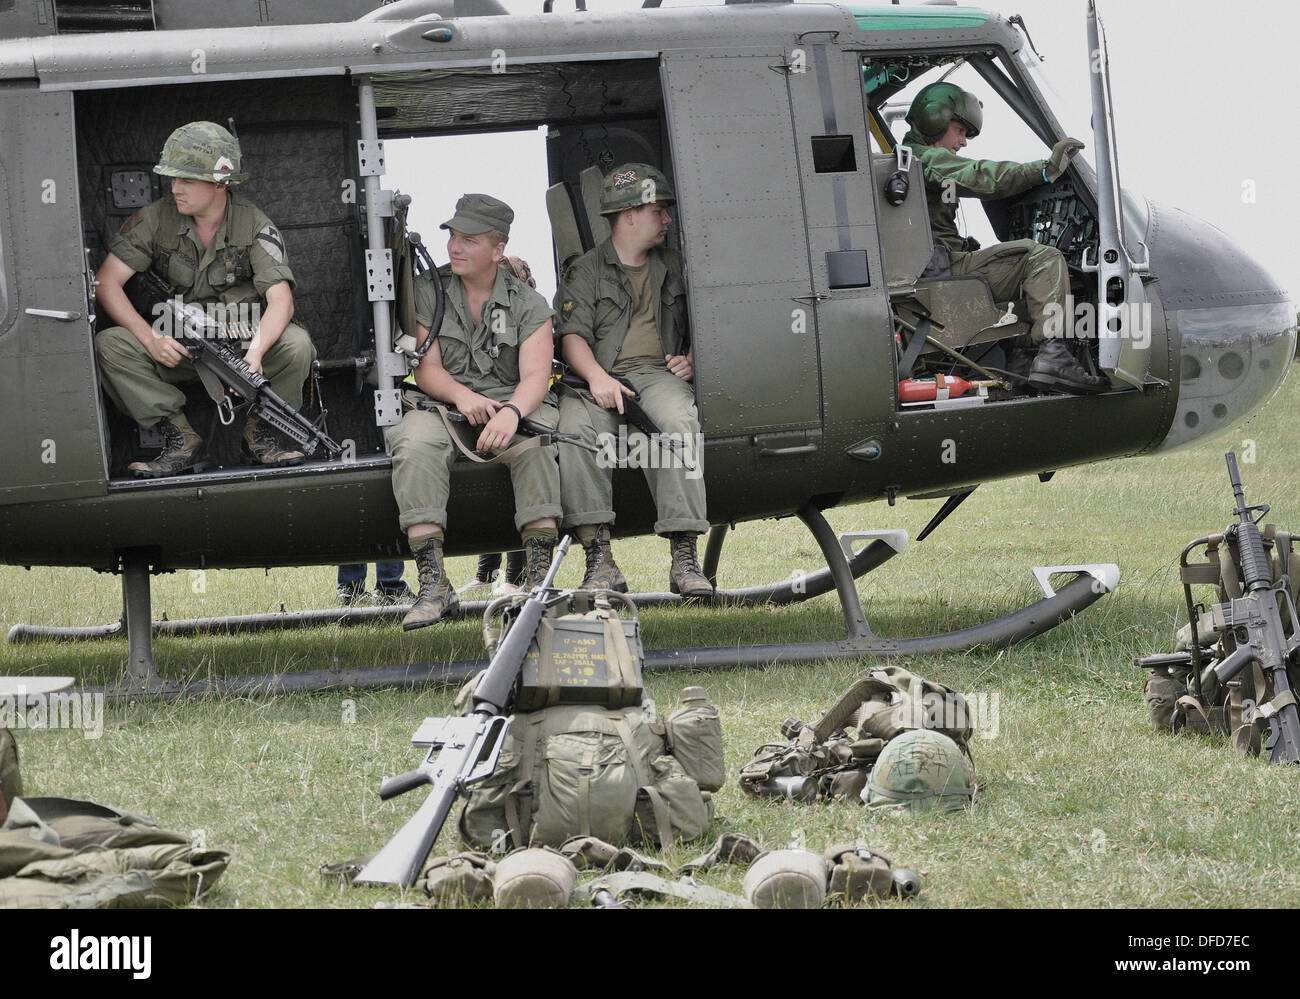 Huey Helicopter For Sale >> Bell UH-1 'Huey' with re-enactors to represent Vietnam War scenario Stock Photo: 61142212 - Alamy